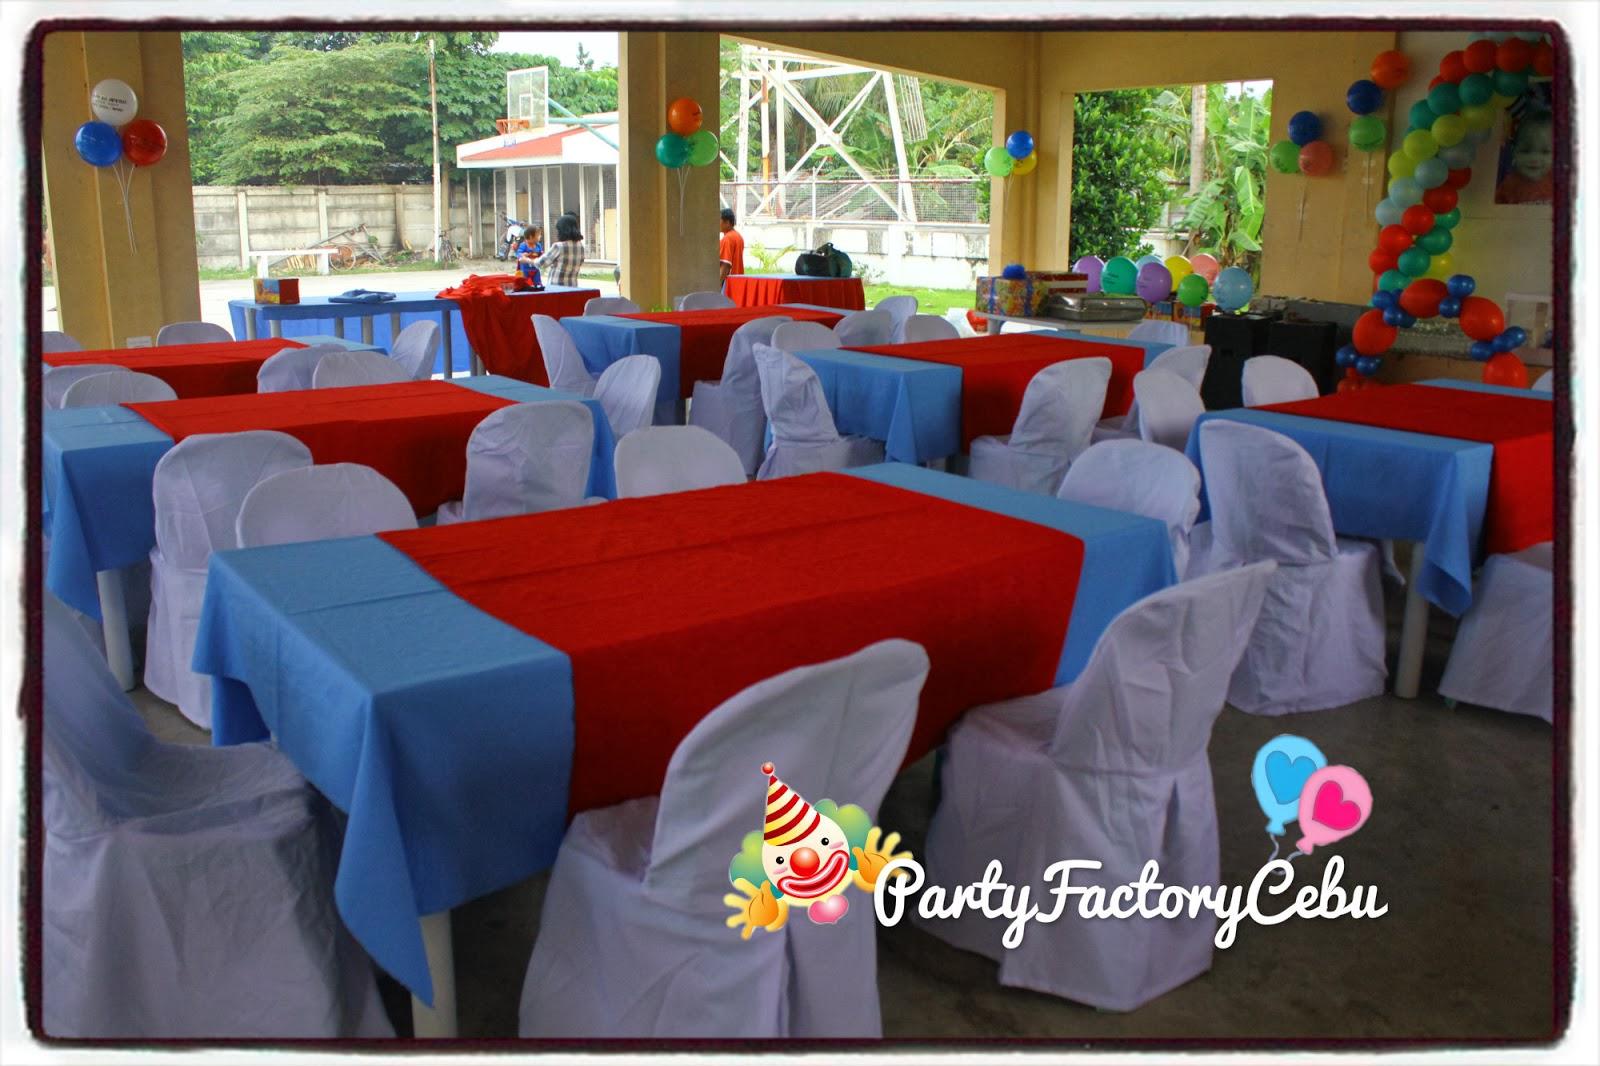 Welcome To Partyfactory Cebu Petter Johan 1st Birthday Bash